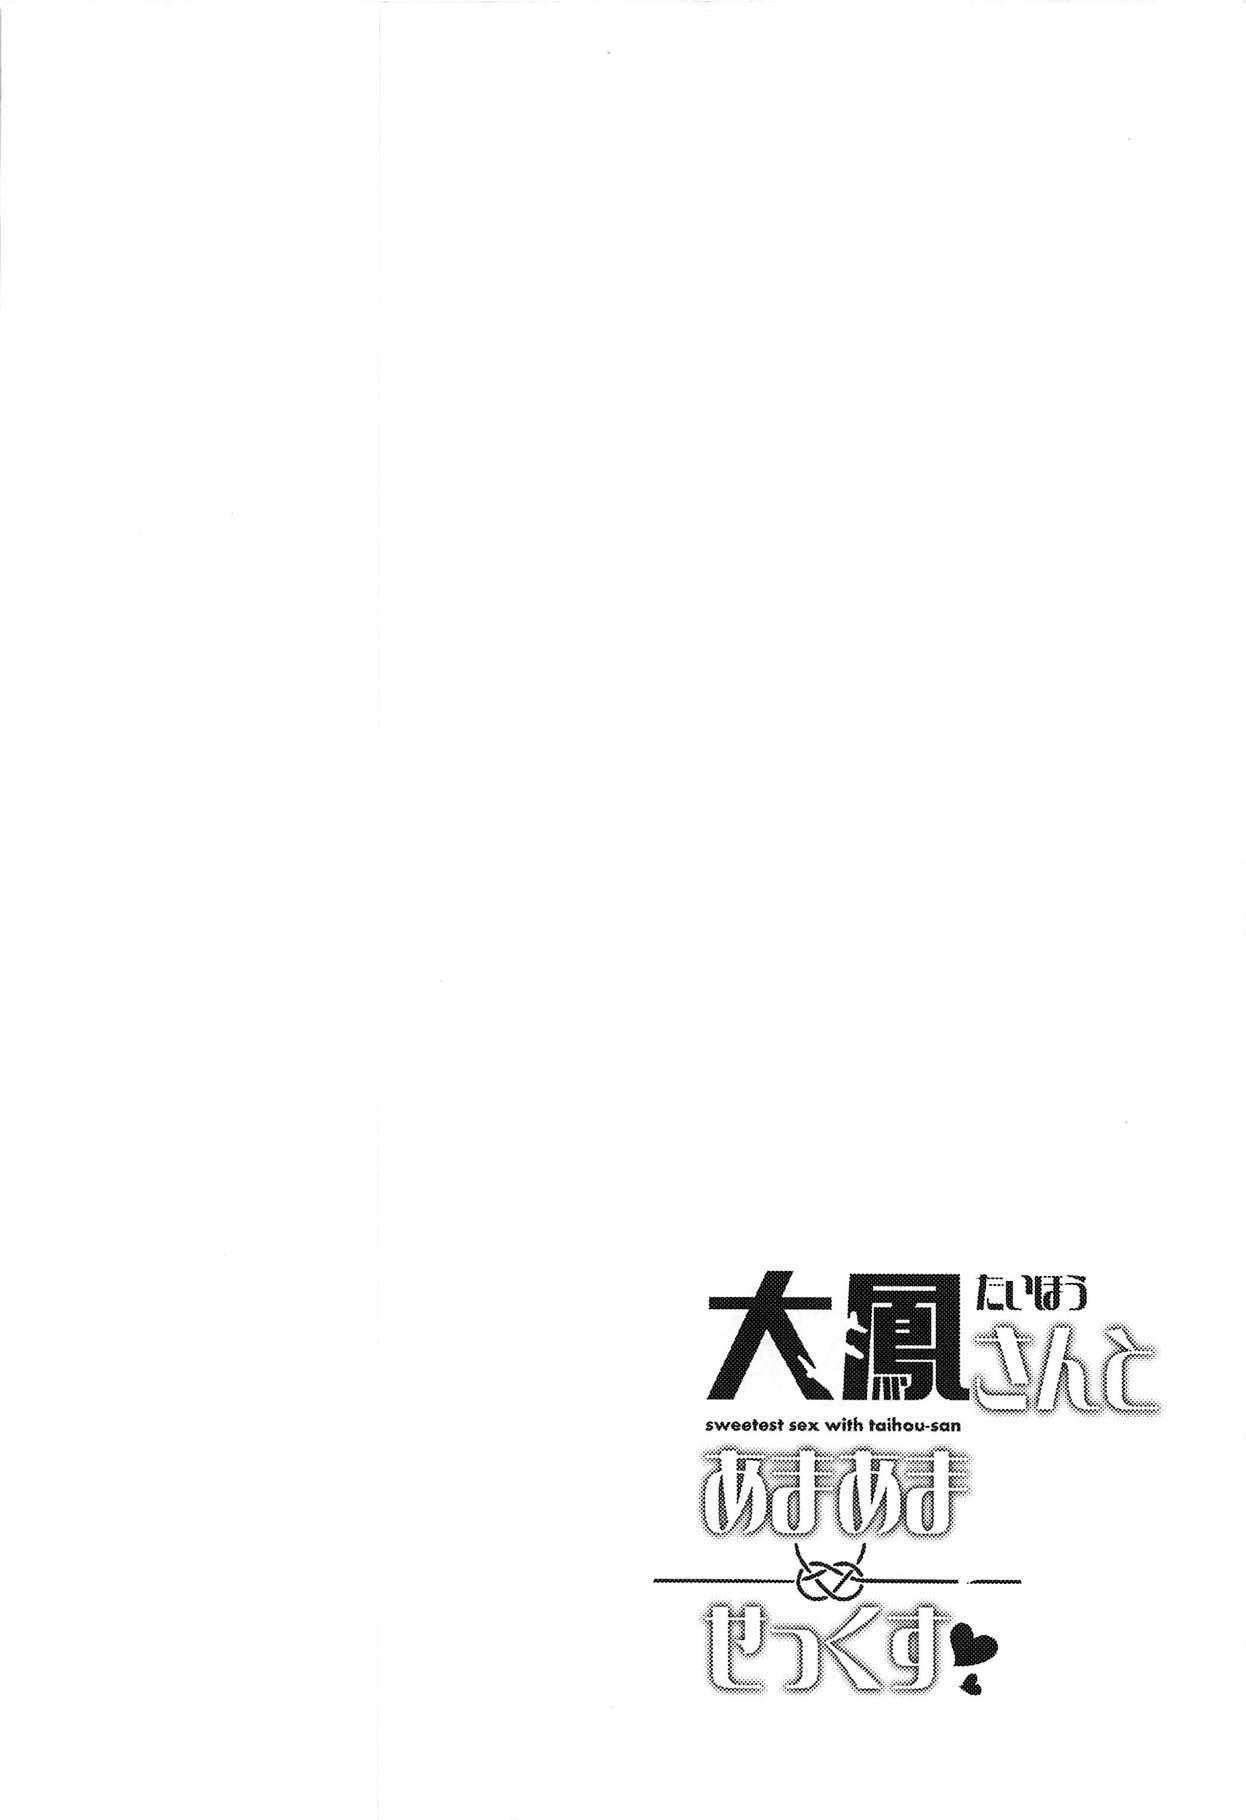 (C95) [Aratoya (Arato Asato)] Taihou-san to Amaama Sex - sweetest sex with taihou-san (Azur Lane) [Chinese] [黎欧x新桥月白日语社] 16